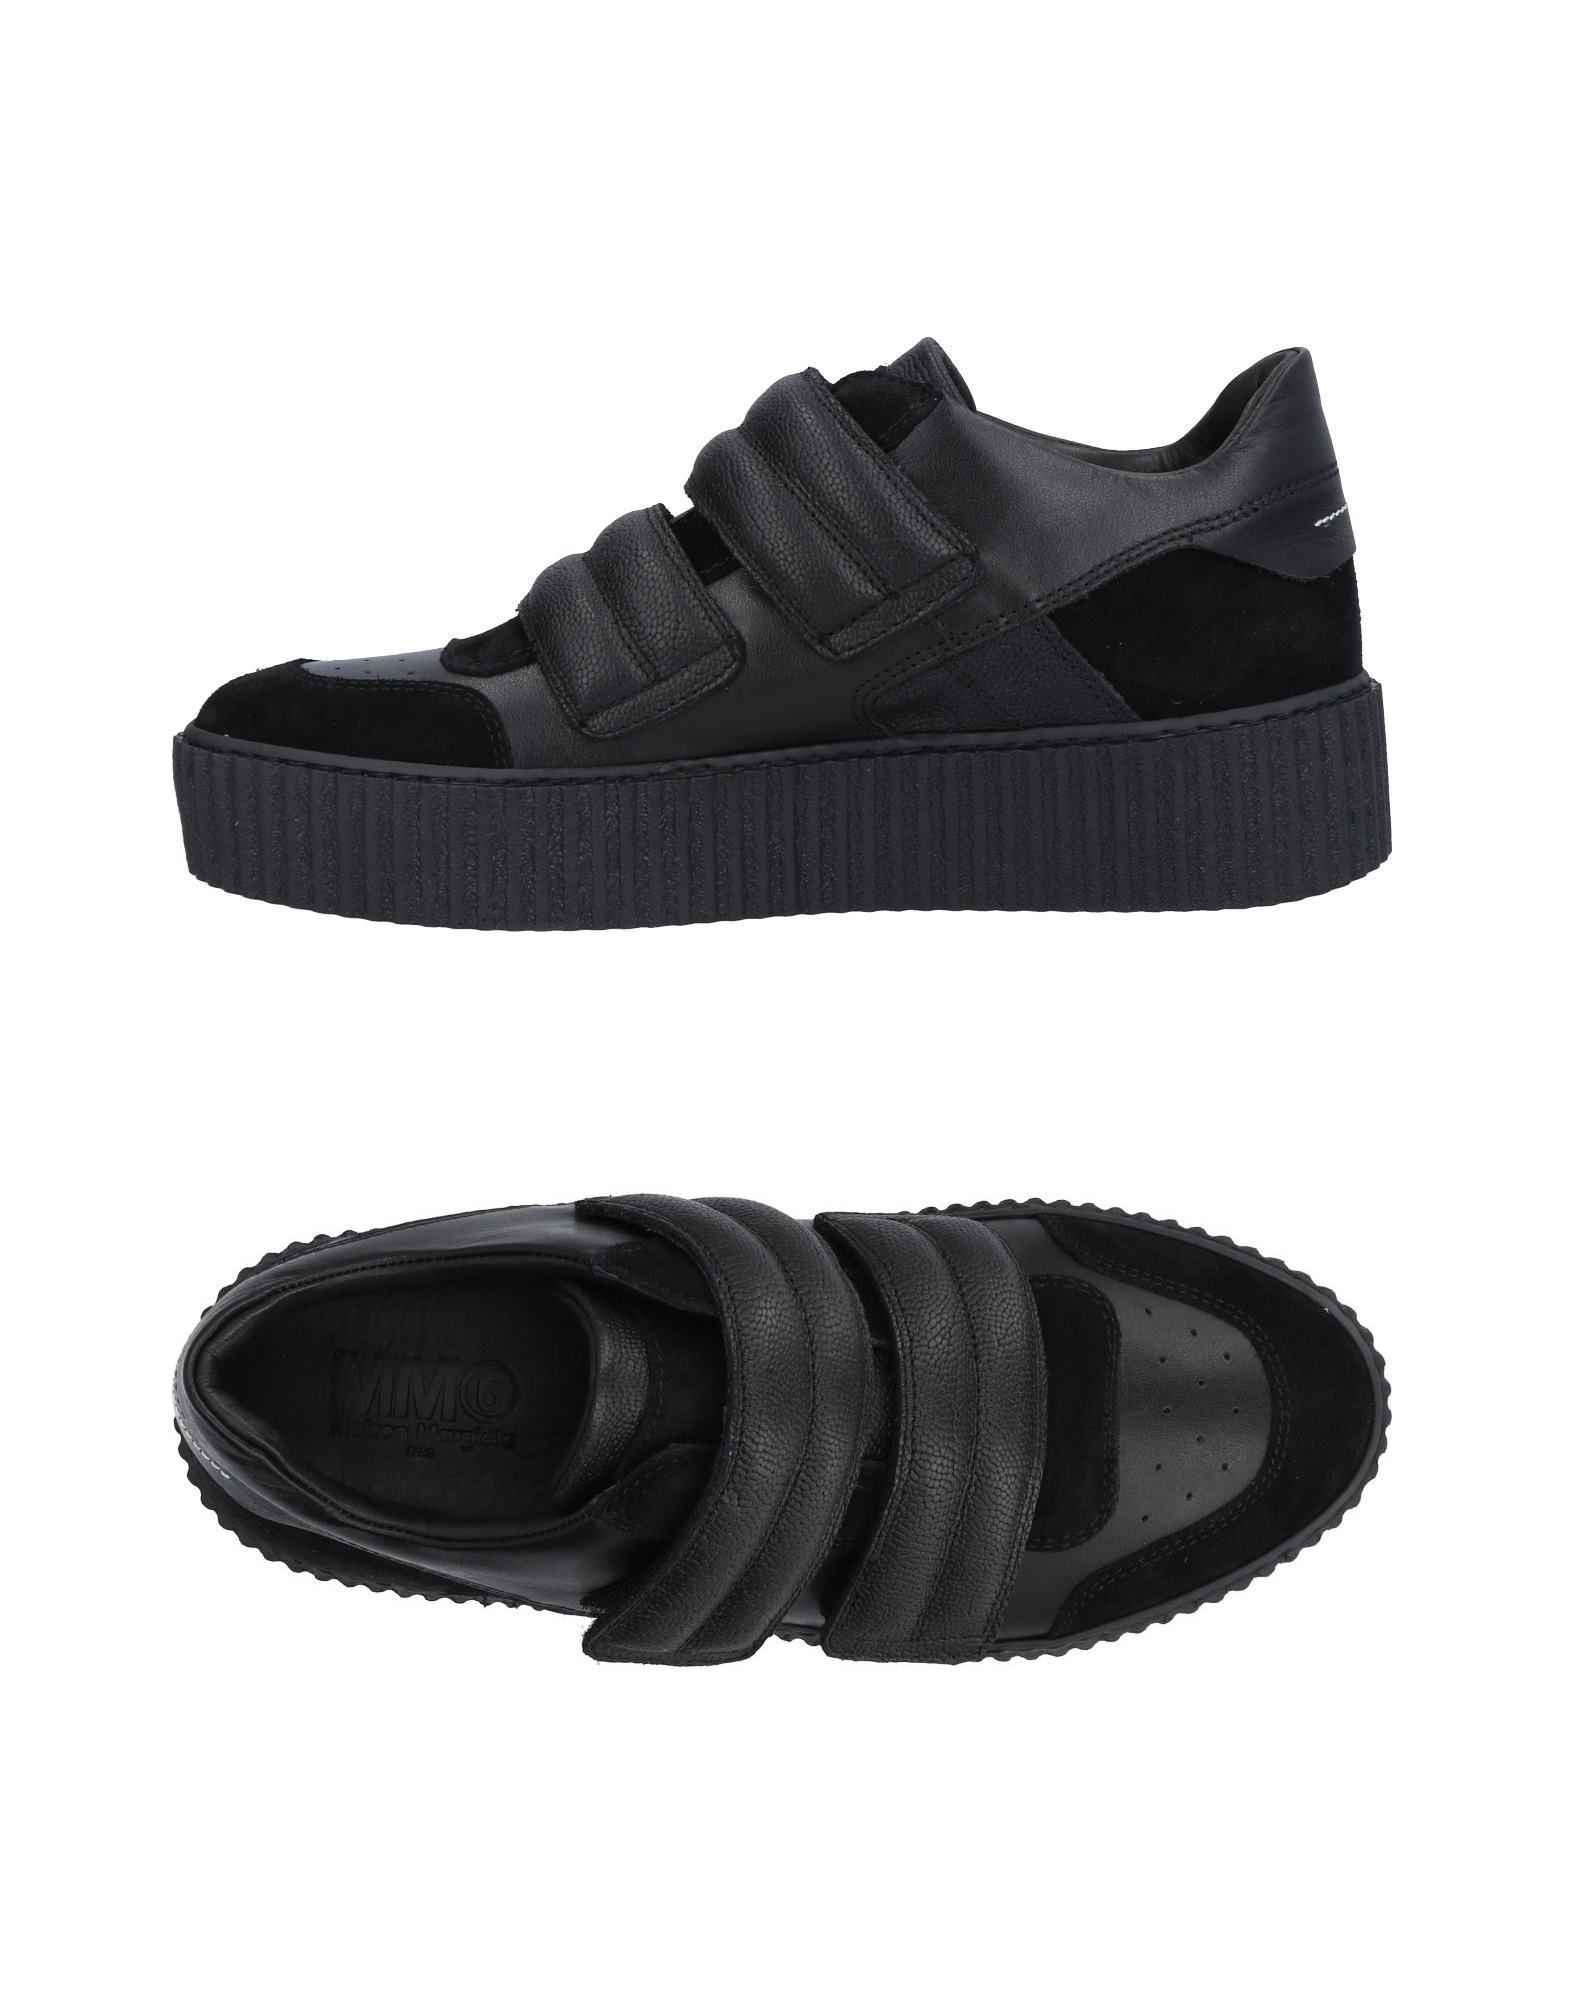 MM6 Maison Margiela Black Leather Sneakers